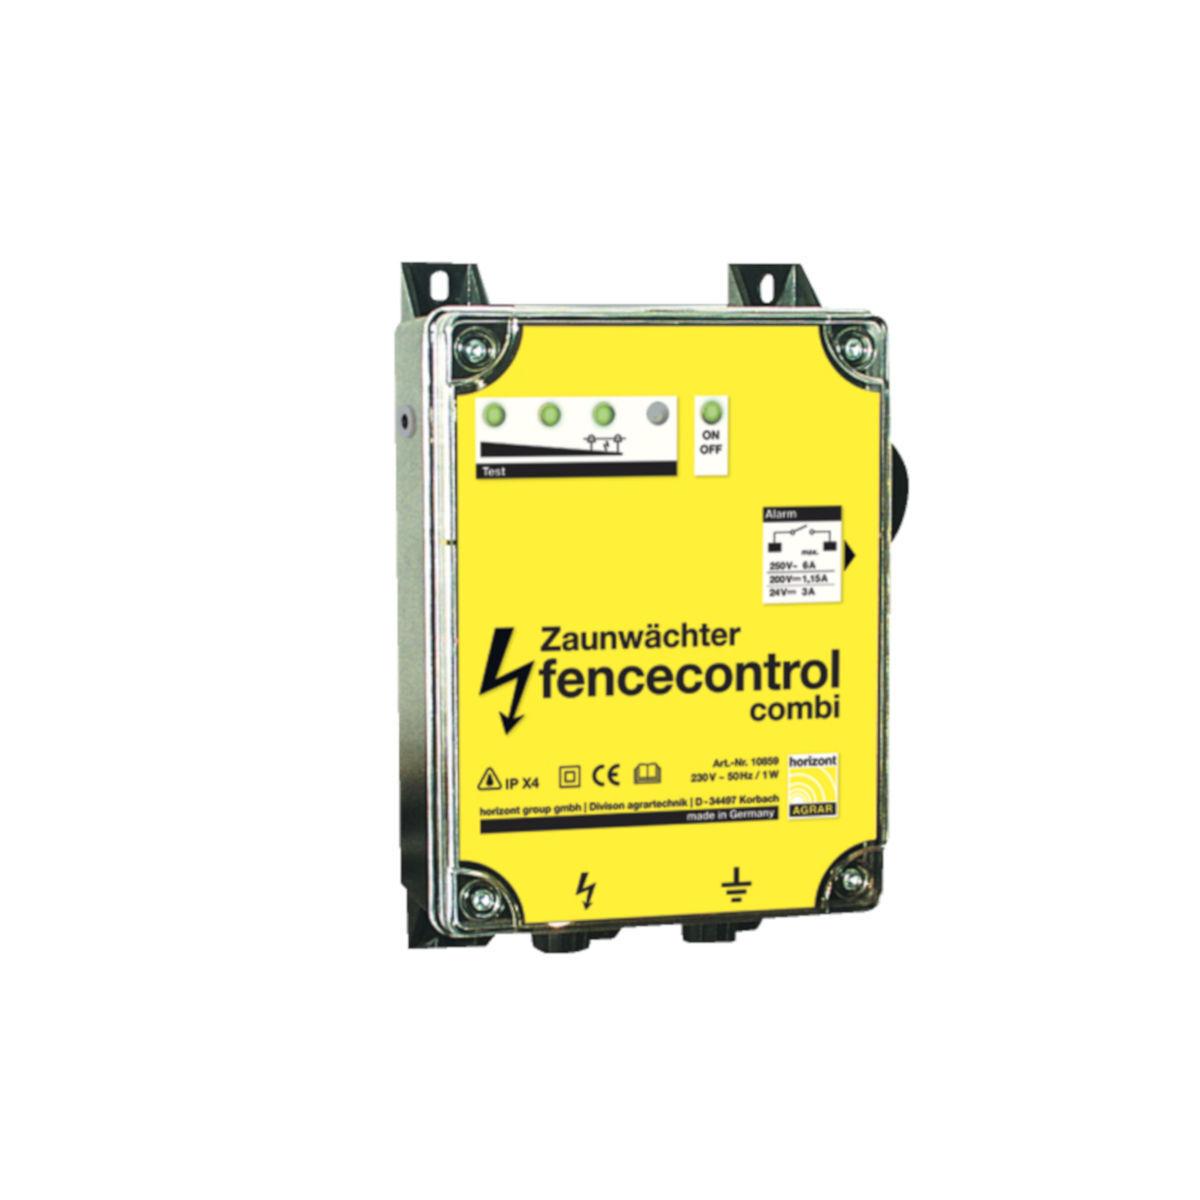 Horizont Zaunwächter fencecontrol 12 230 Volt Zaunkontrolle Zaunprüfer Prüfgerät